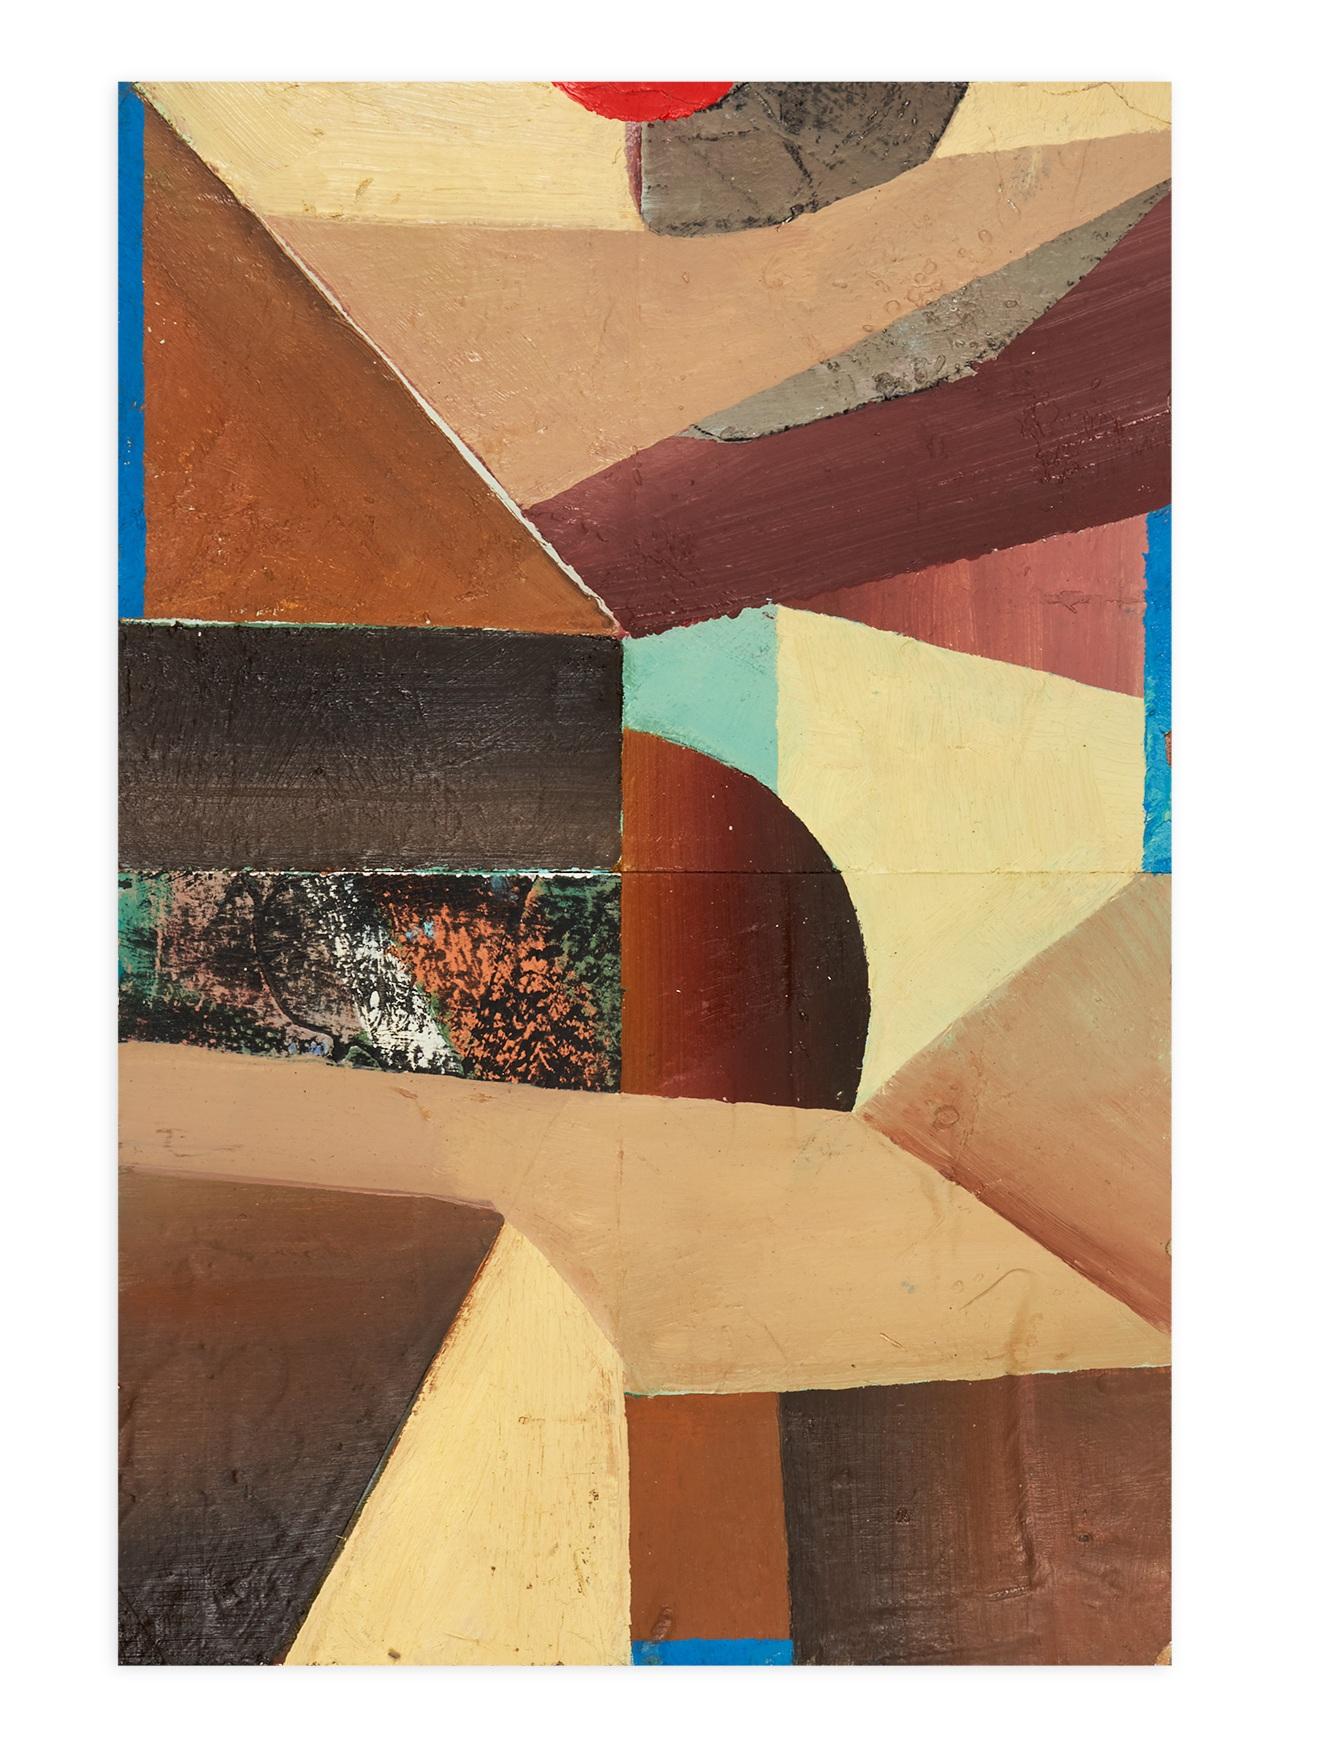 20190502_Santiago-Escobedo-Garcia_Paintings_P46_vertical_small-web.jpg